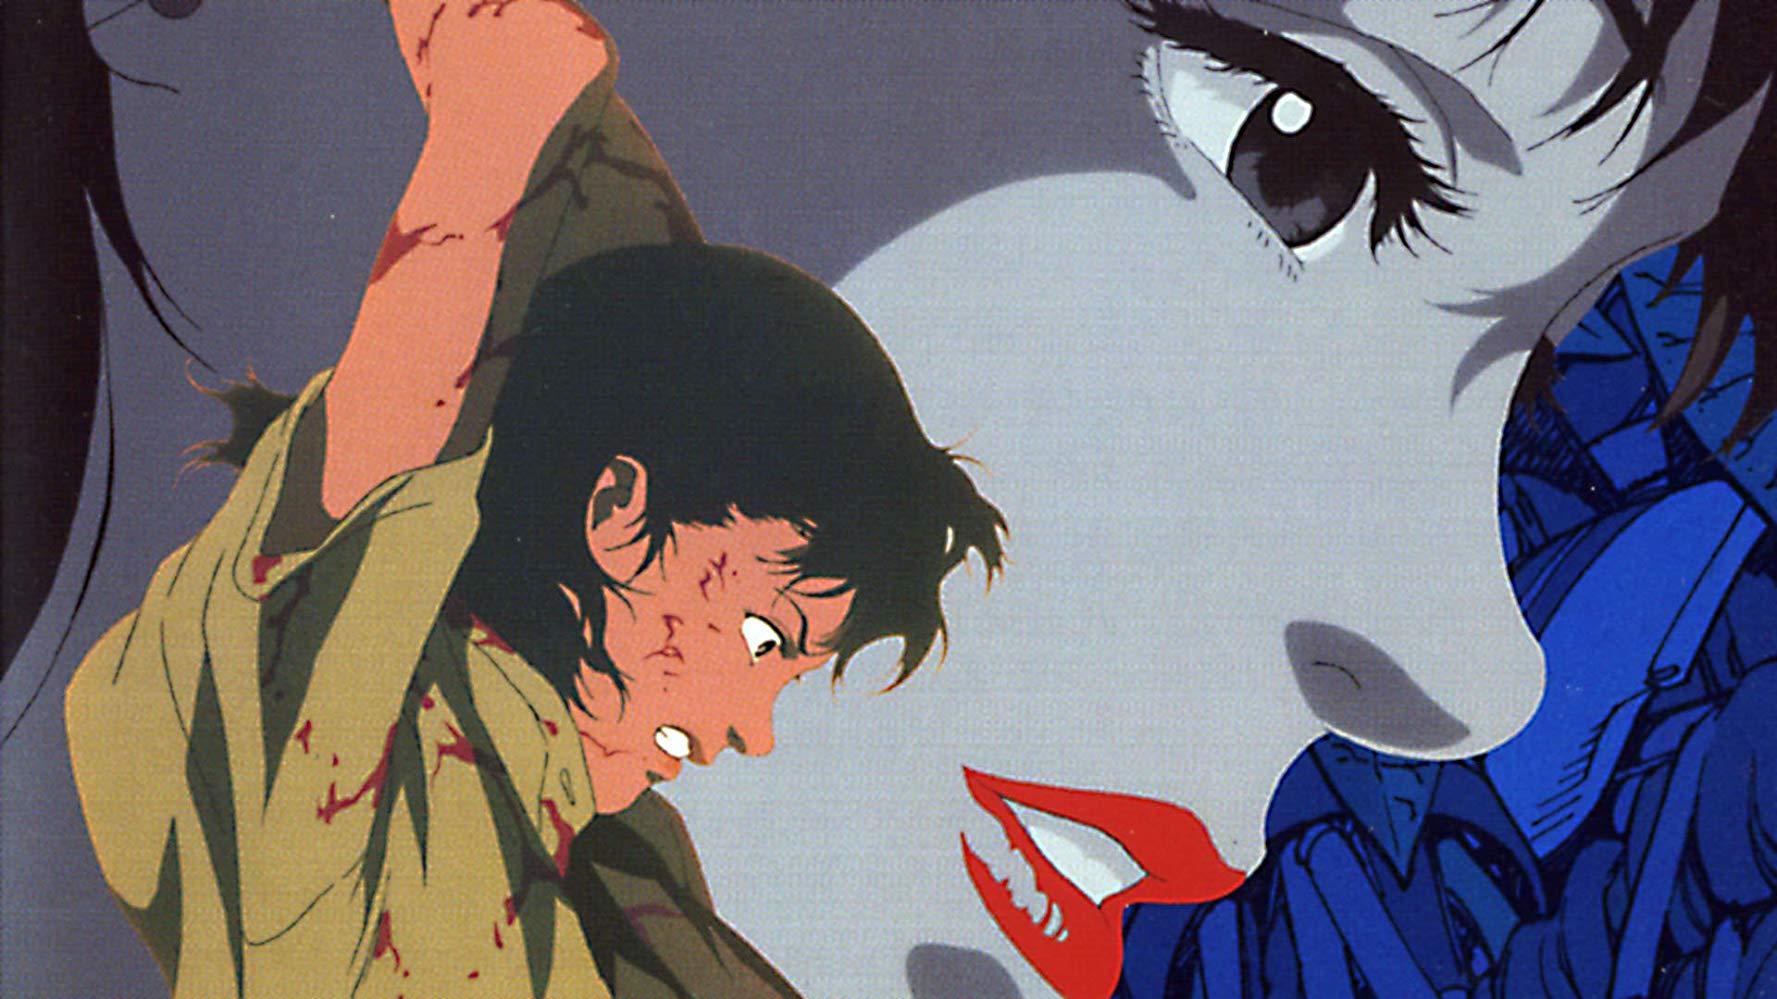 PERFECT BLUE jklj - 10 فیلم ترسناک ژاپنی که نباید به تنهایی نگاه کنید!